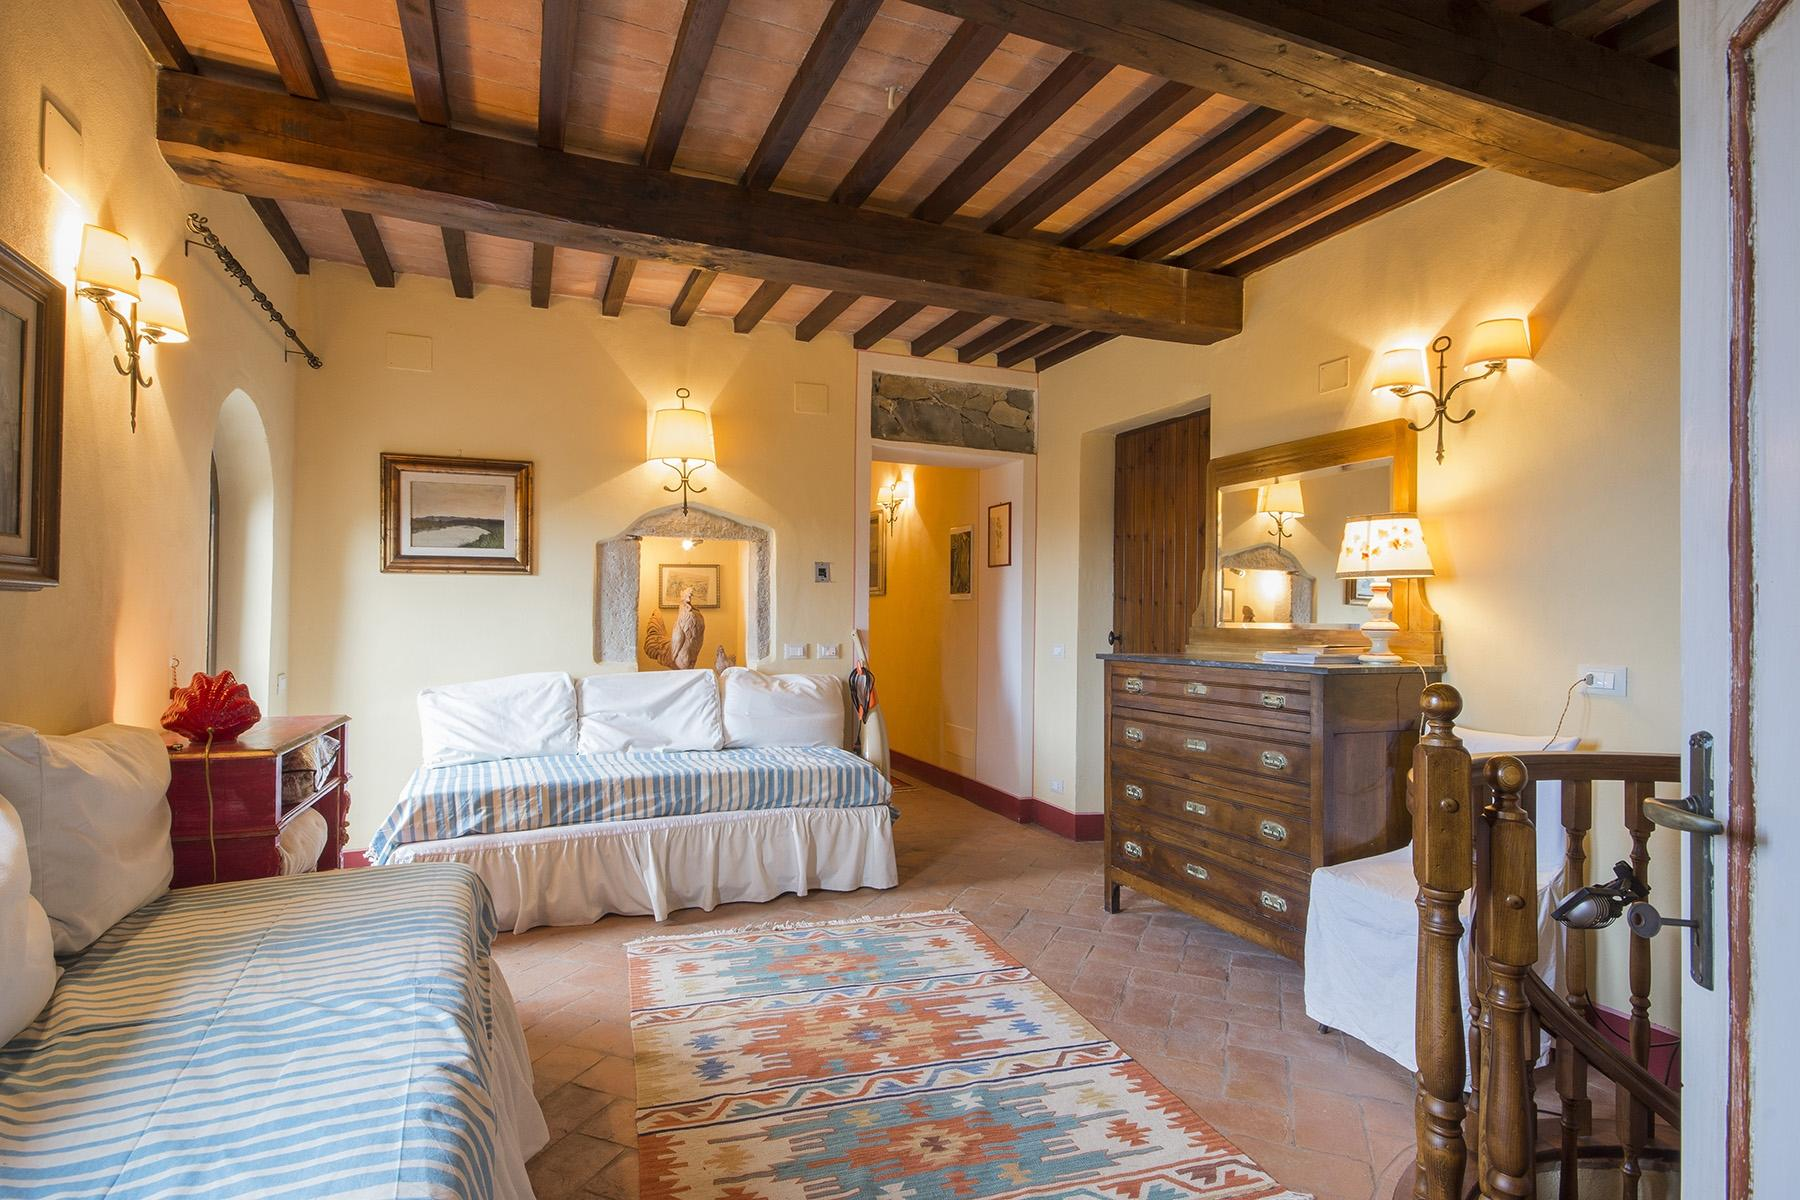 Superb property on the hills of Pisa - 10